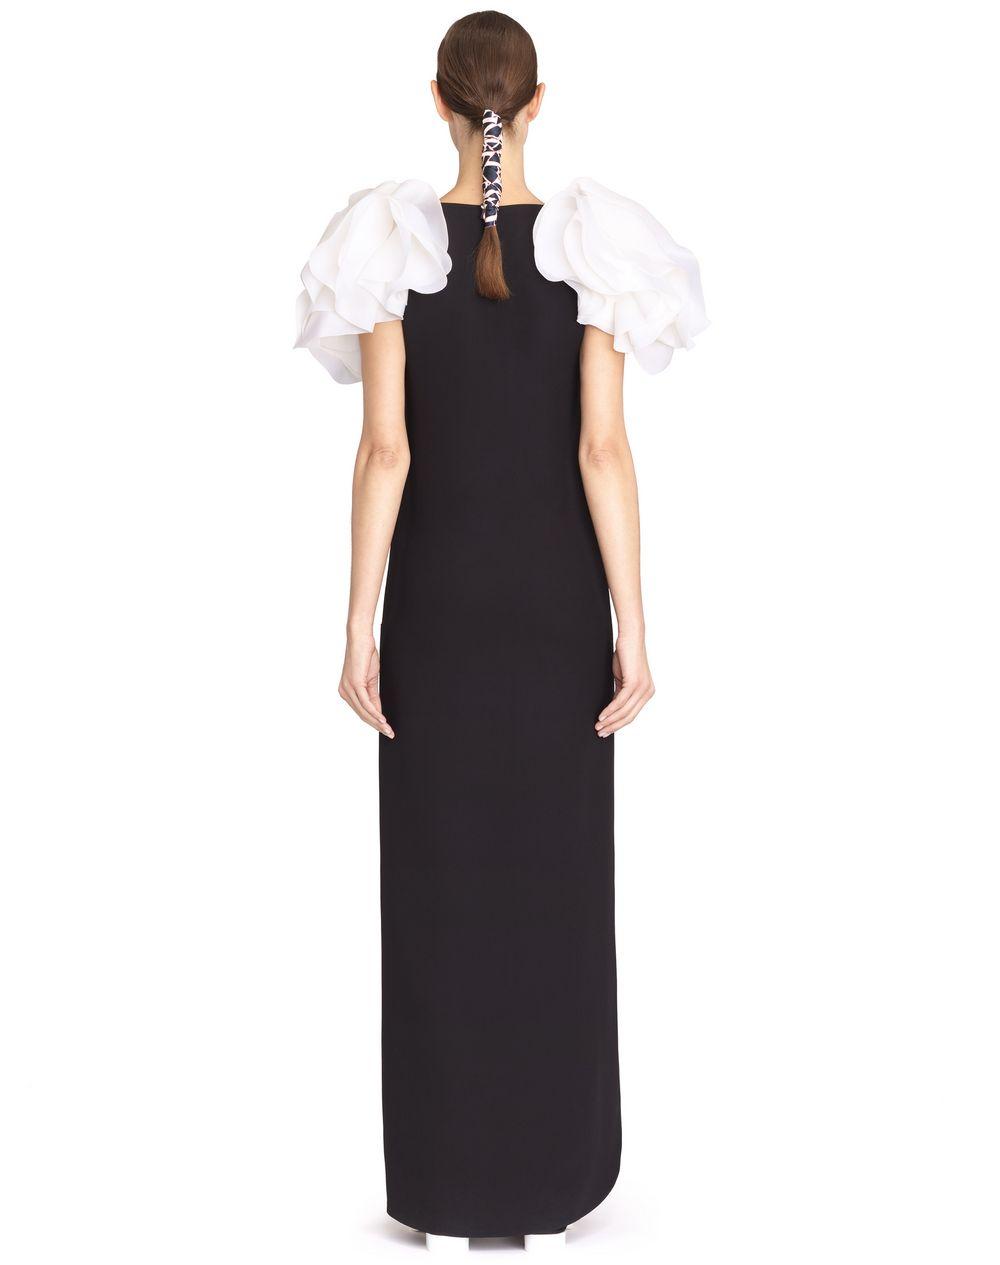 LONG SLIT DRESS - Lanvin